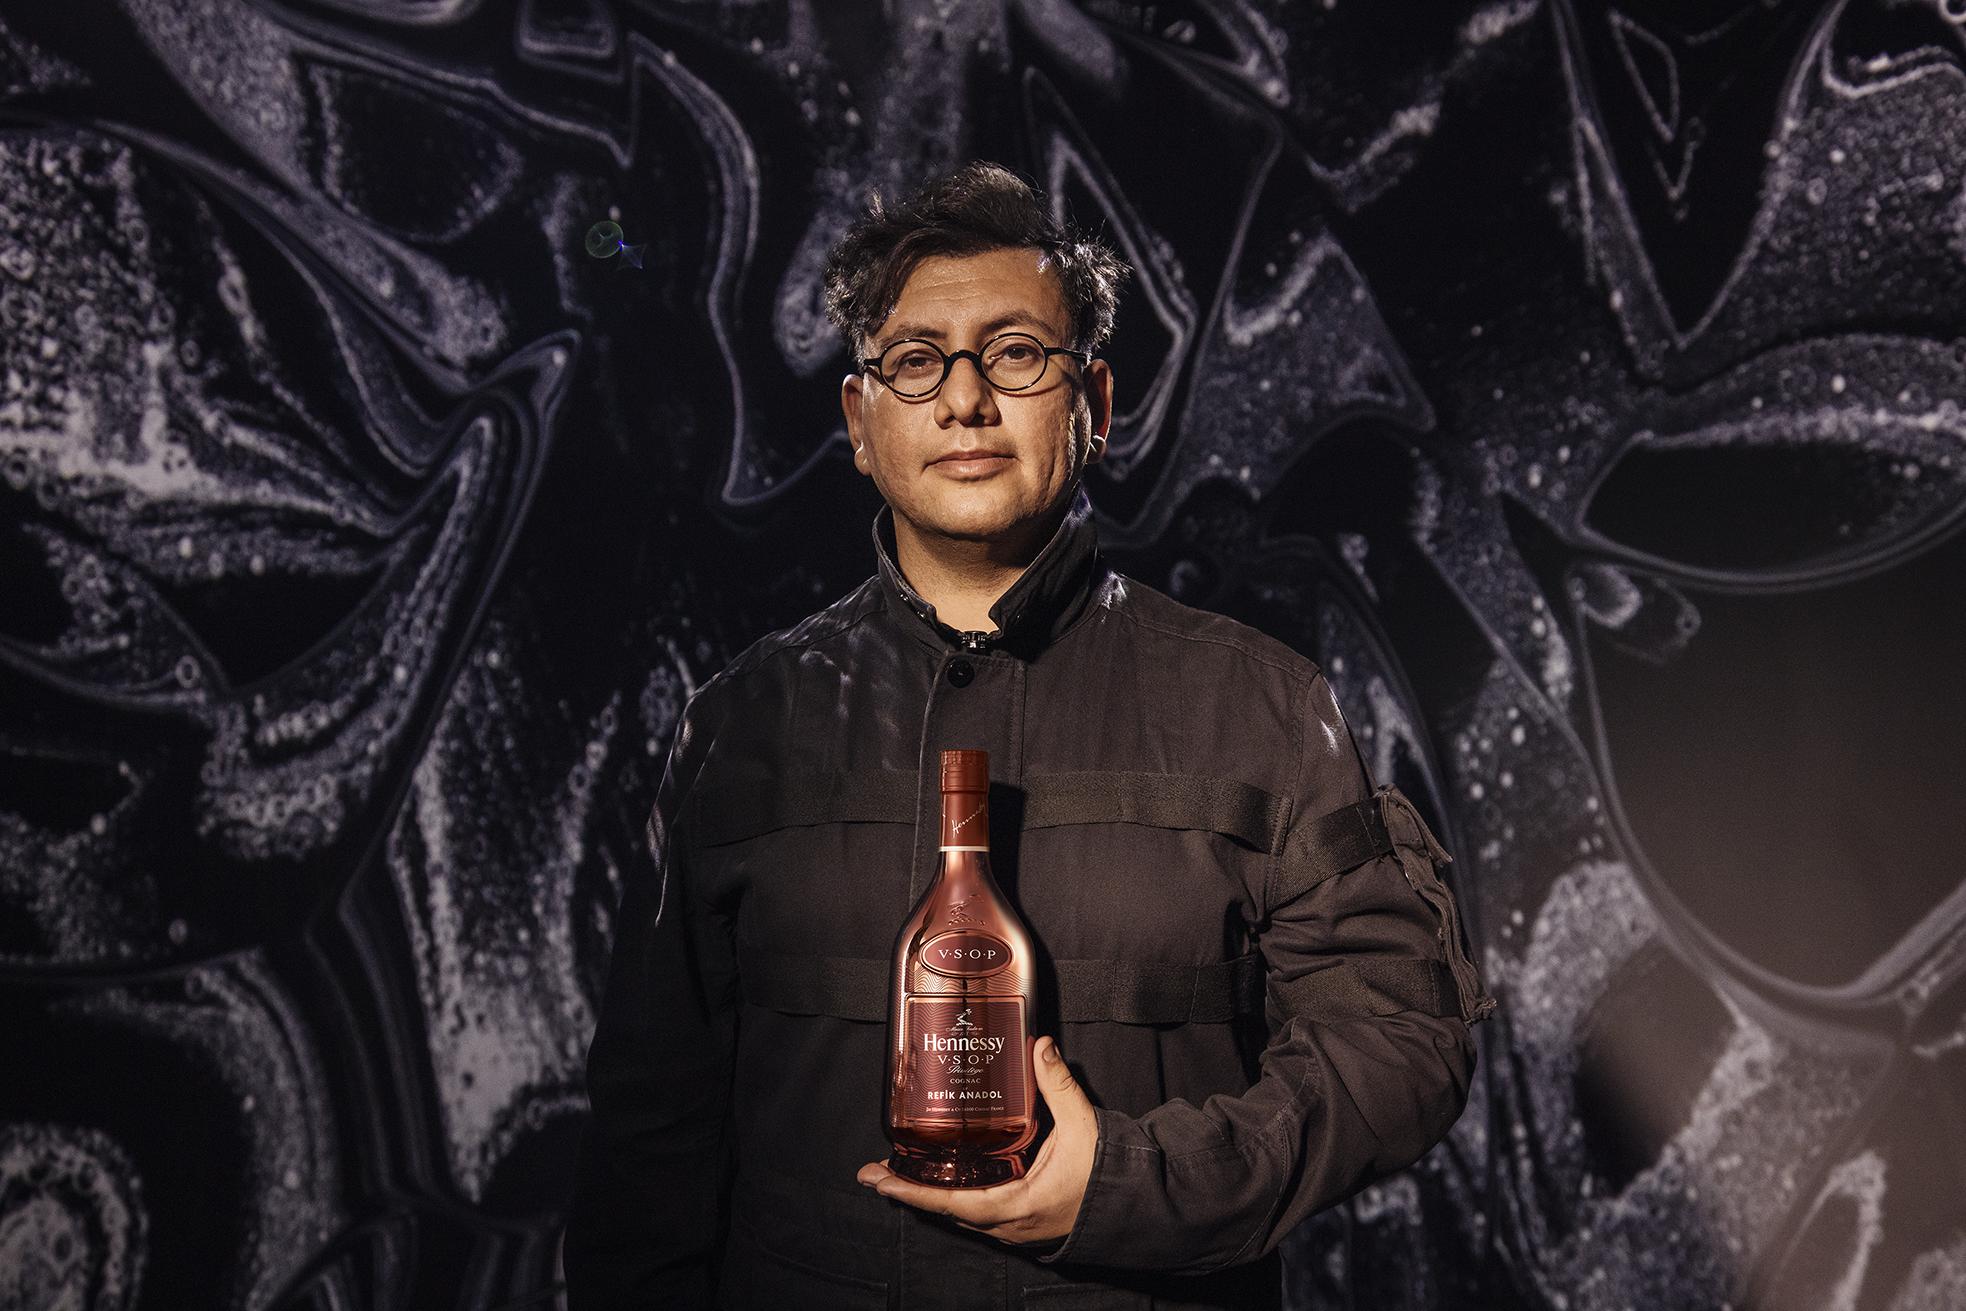 Jordan Bushell Introduces The Hennessy VSOP X Refik Anadol